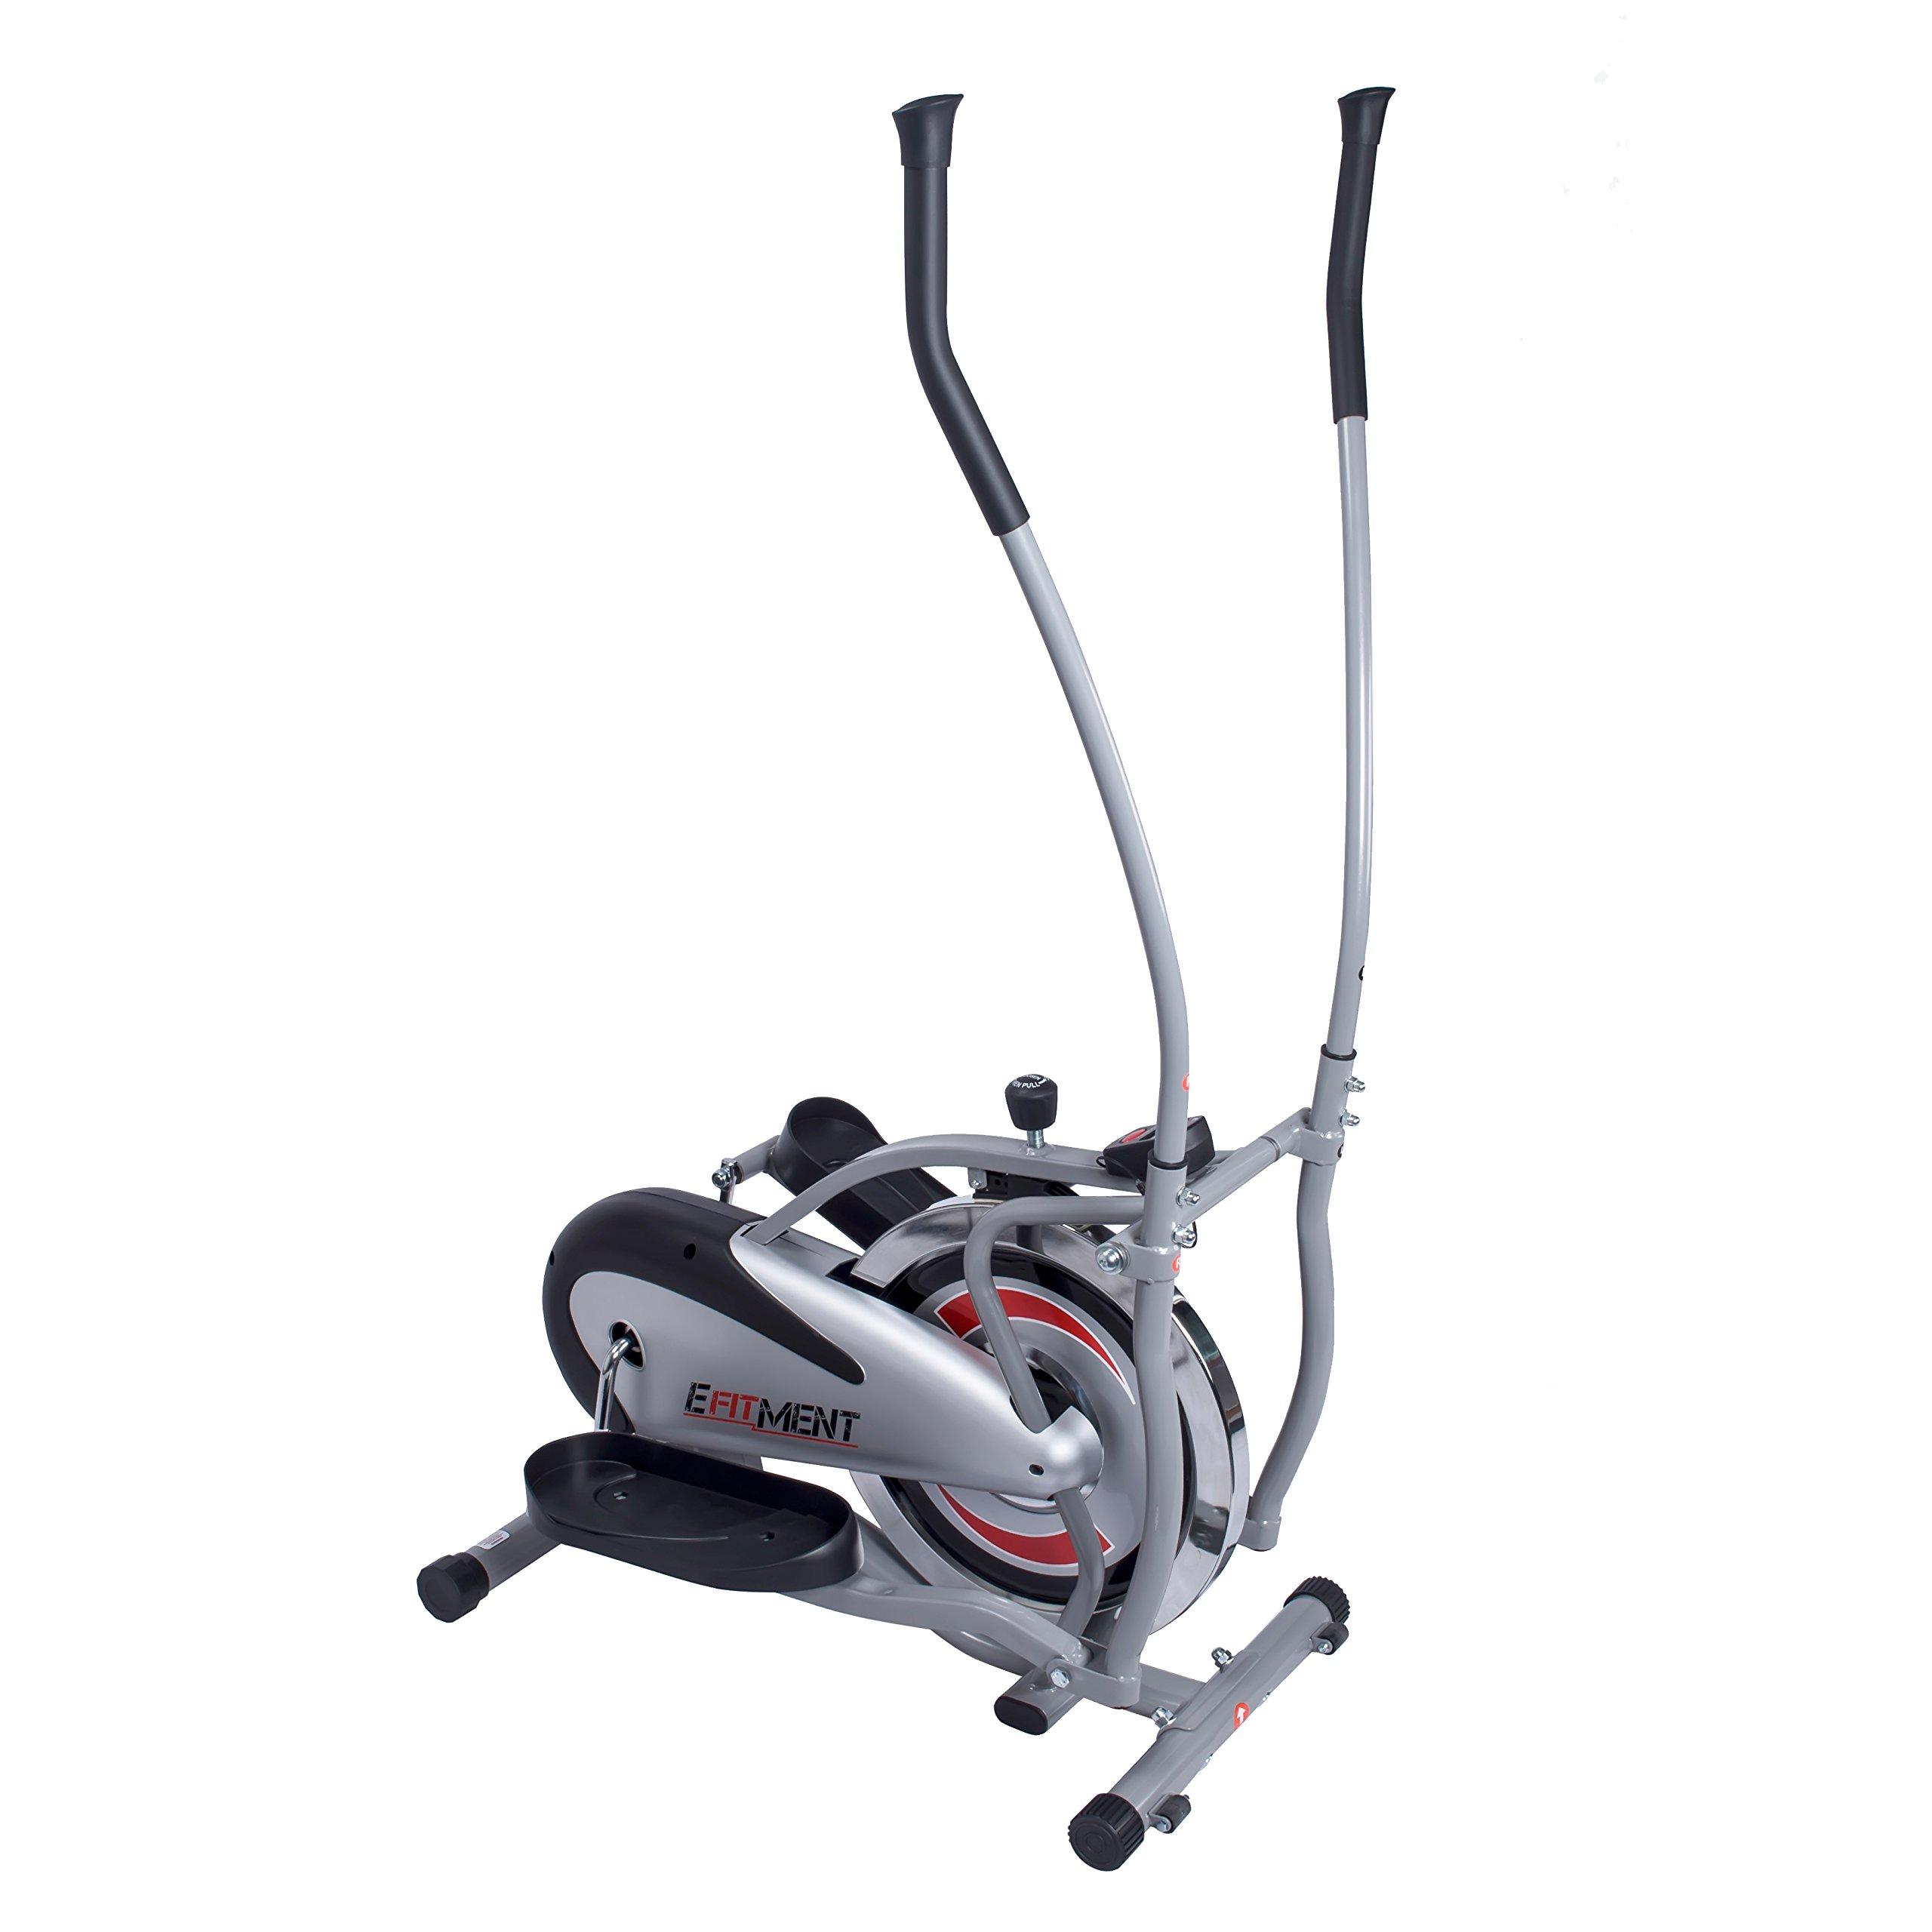 EFITMENT Flywheel Elliptical Machine Cross Trainer - E018